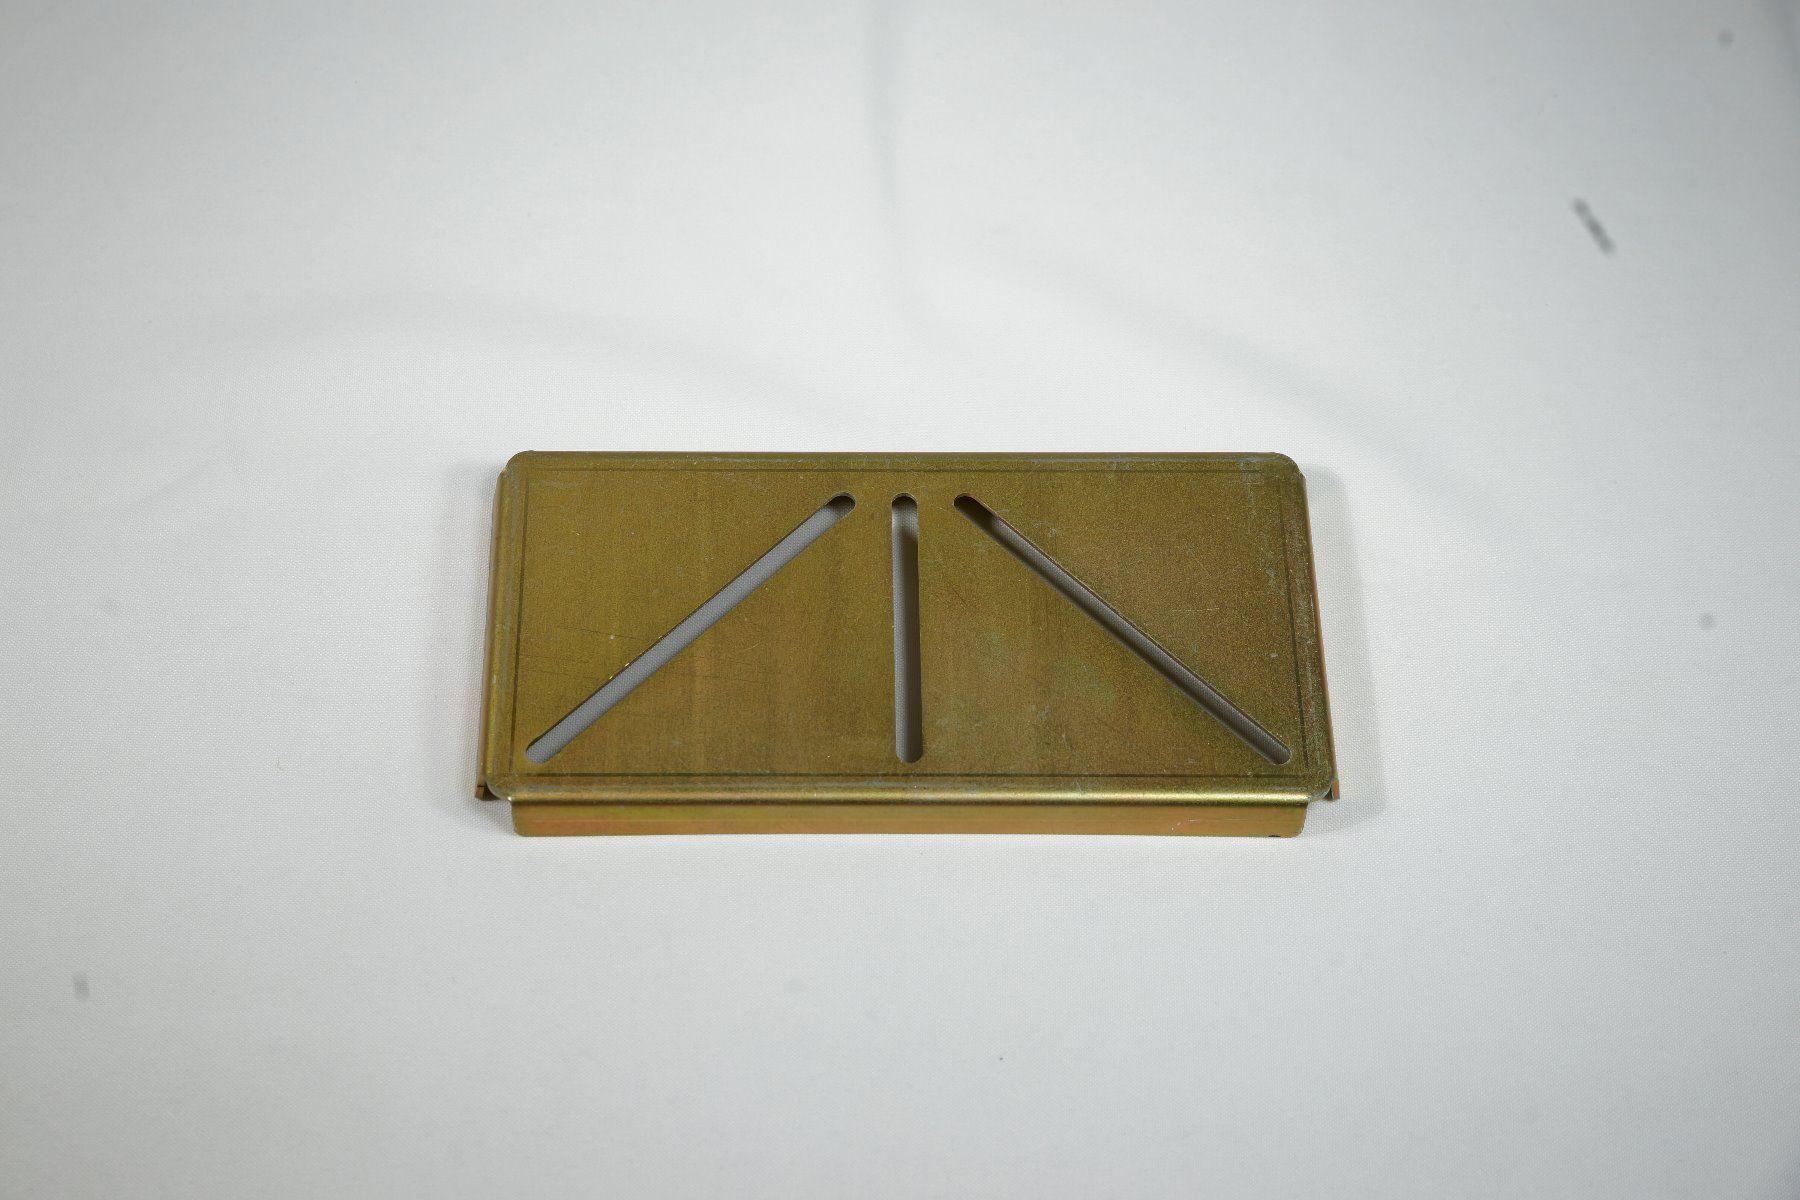 4 x 45 TemplateMARKER-A  3.97 x 7.91 in (101 x 201 mm)